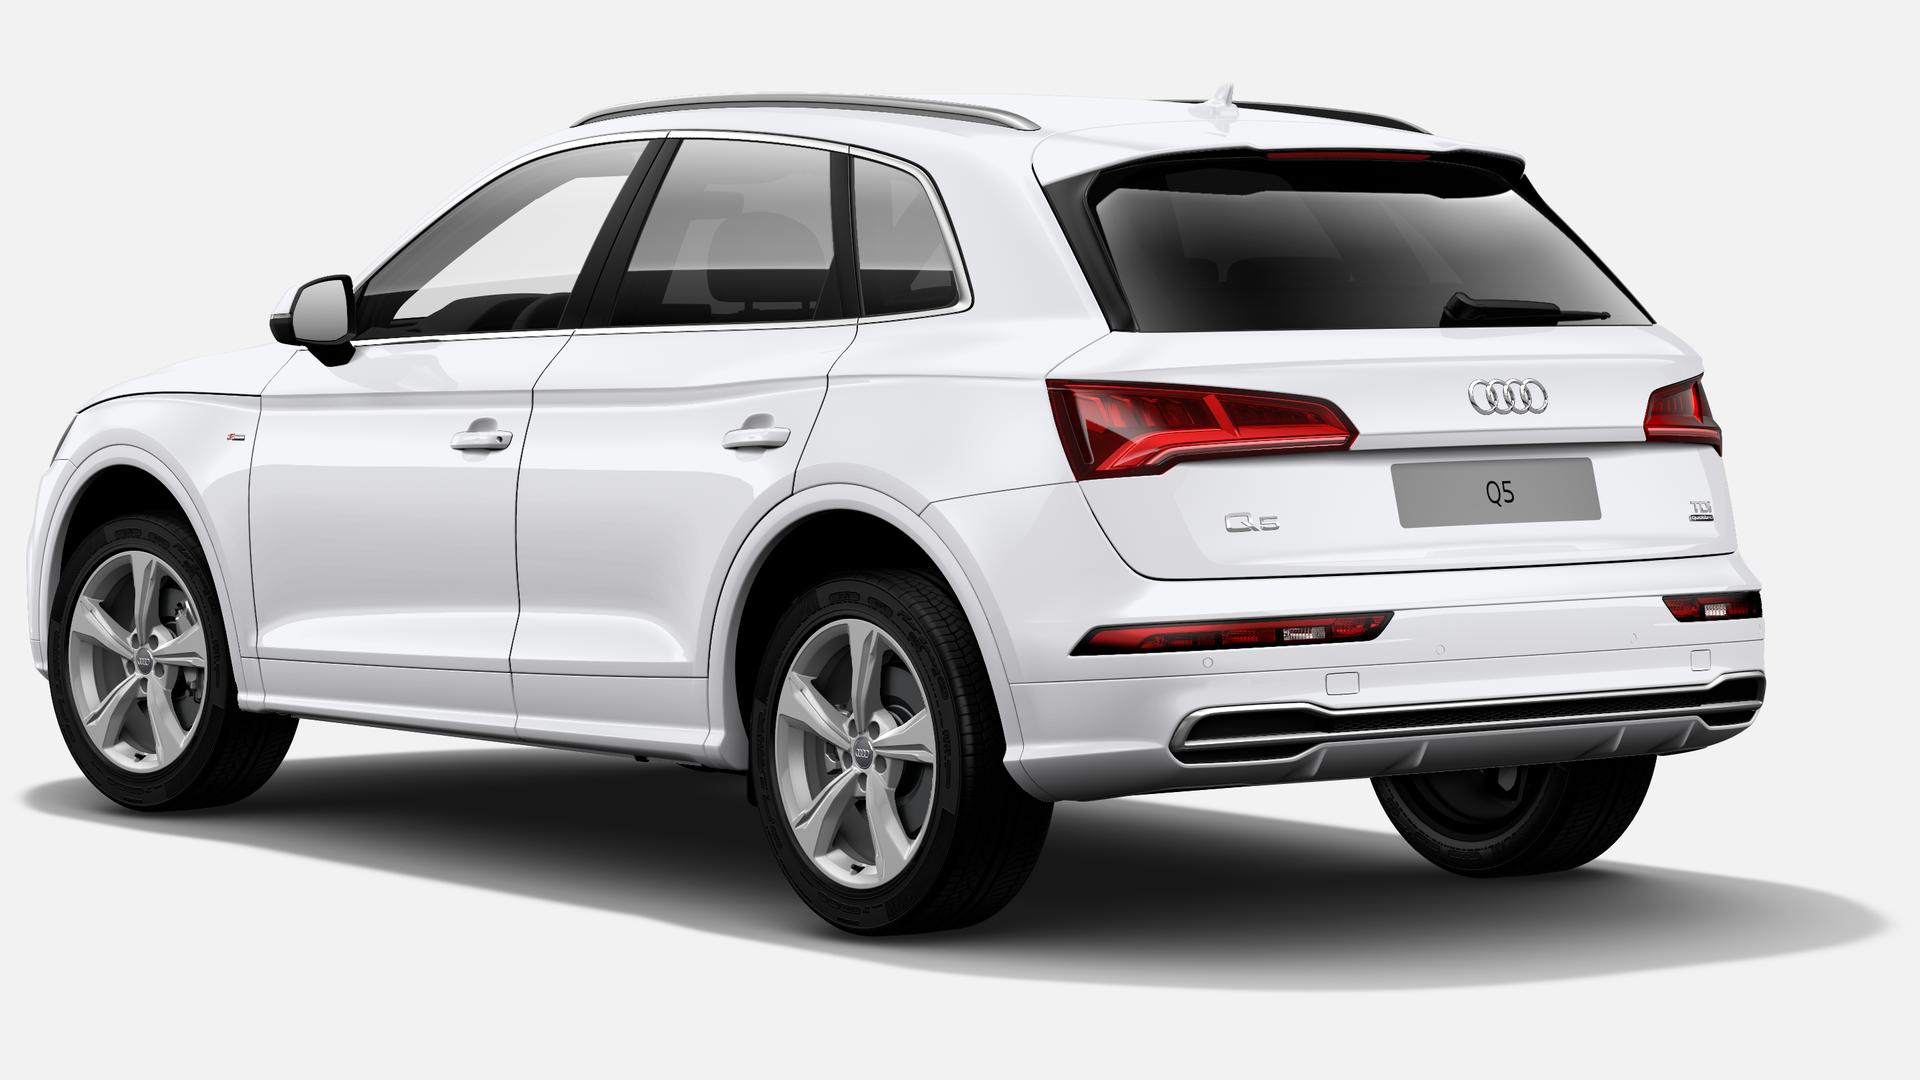 Vista Tres cuartos trasera izquierda de Audi Q5 2.0 TDI S Line Quattro S Tronic 140 kW (190 CV)